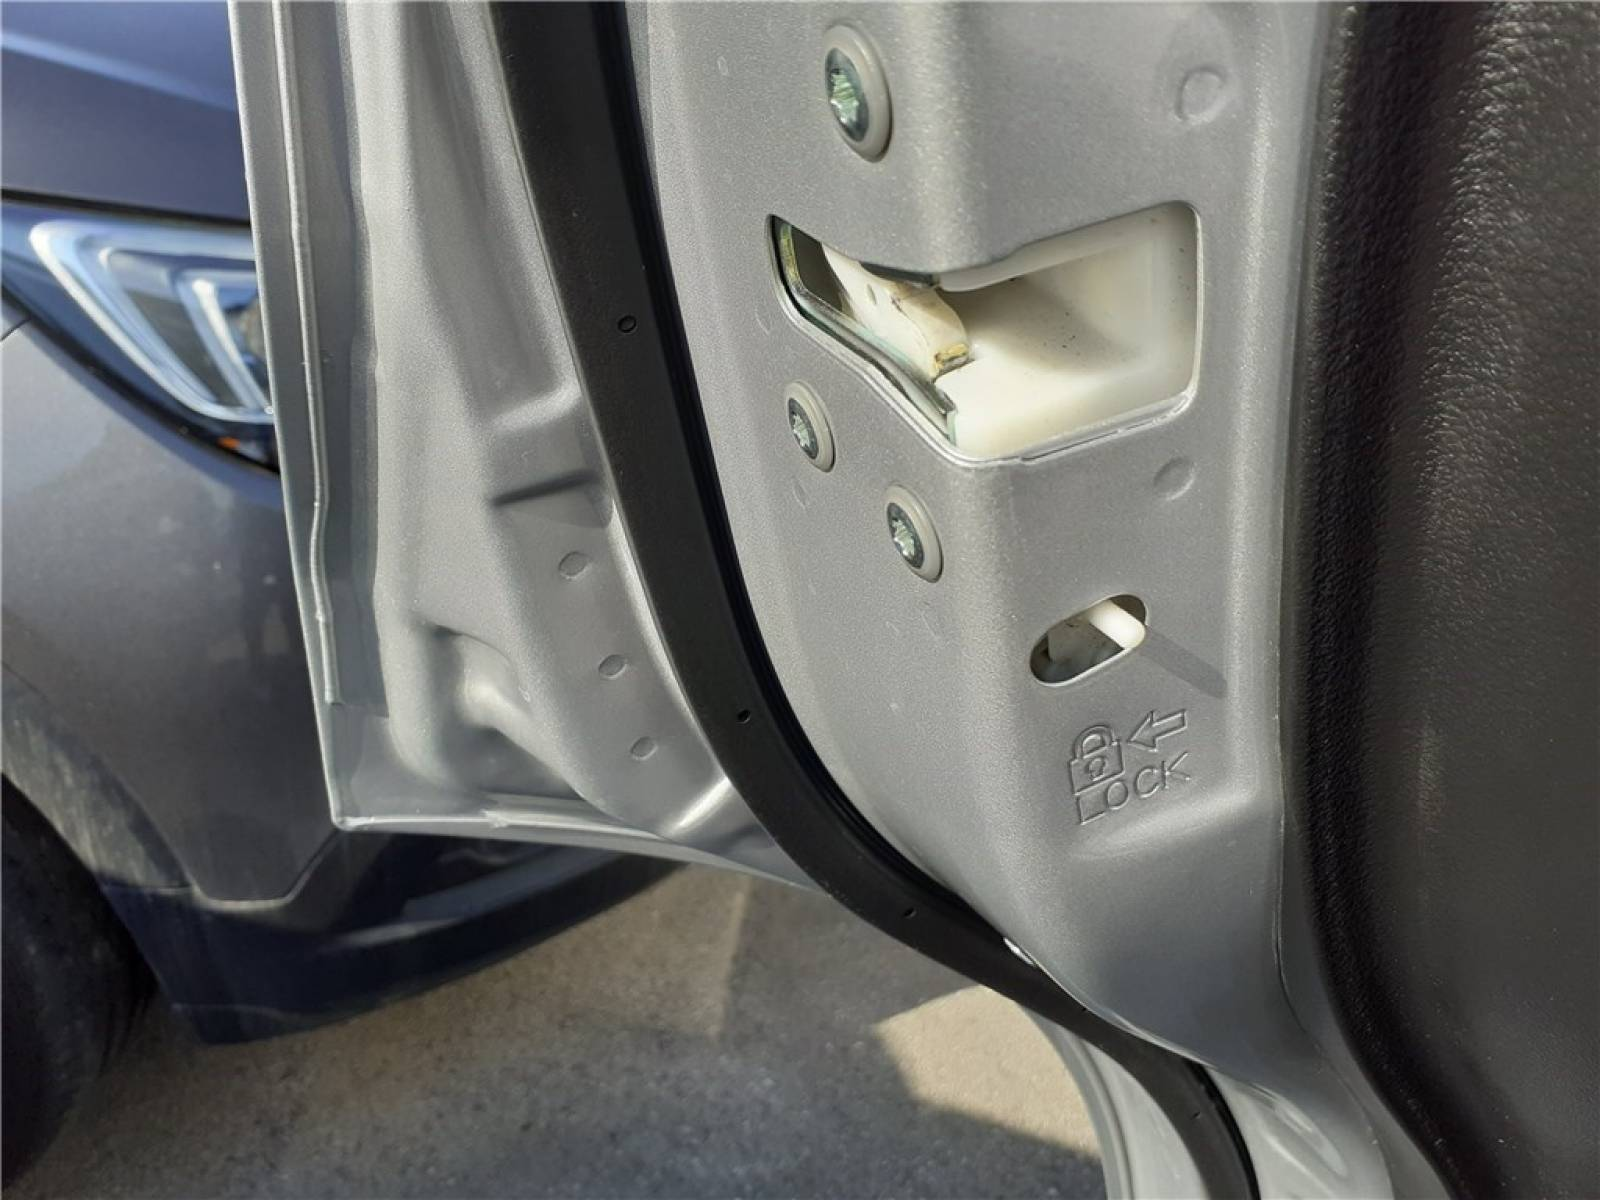 SUZUKI Vitara 1.0 Boosterjet - véhicule d'occasion - Groupe Guillet - Opel Magicauto - Chalon-sur-Saône - 71380 - Saint-Marcel - 15